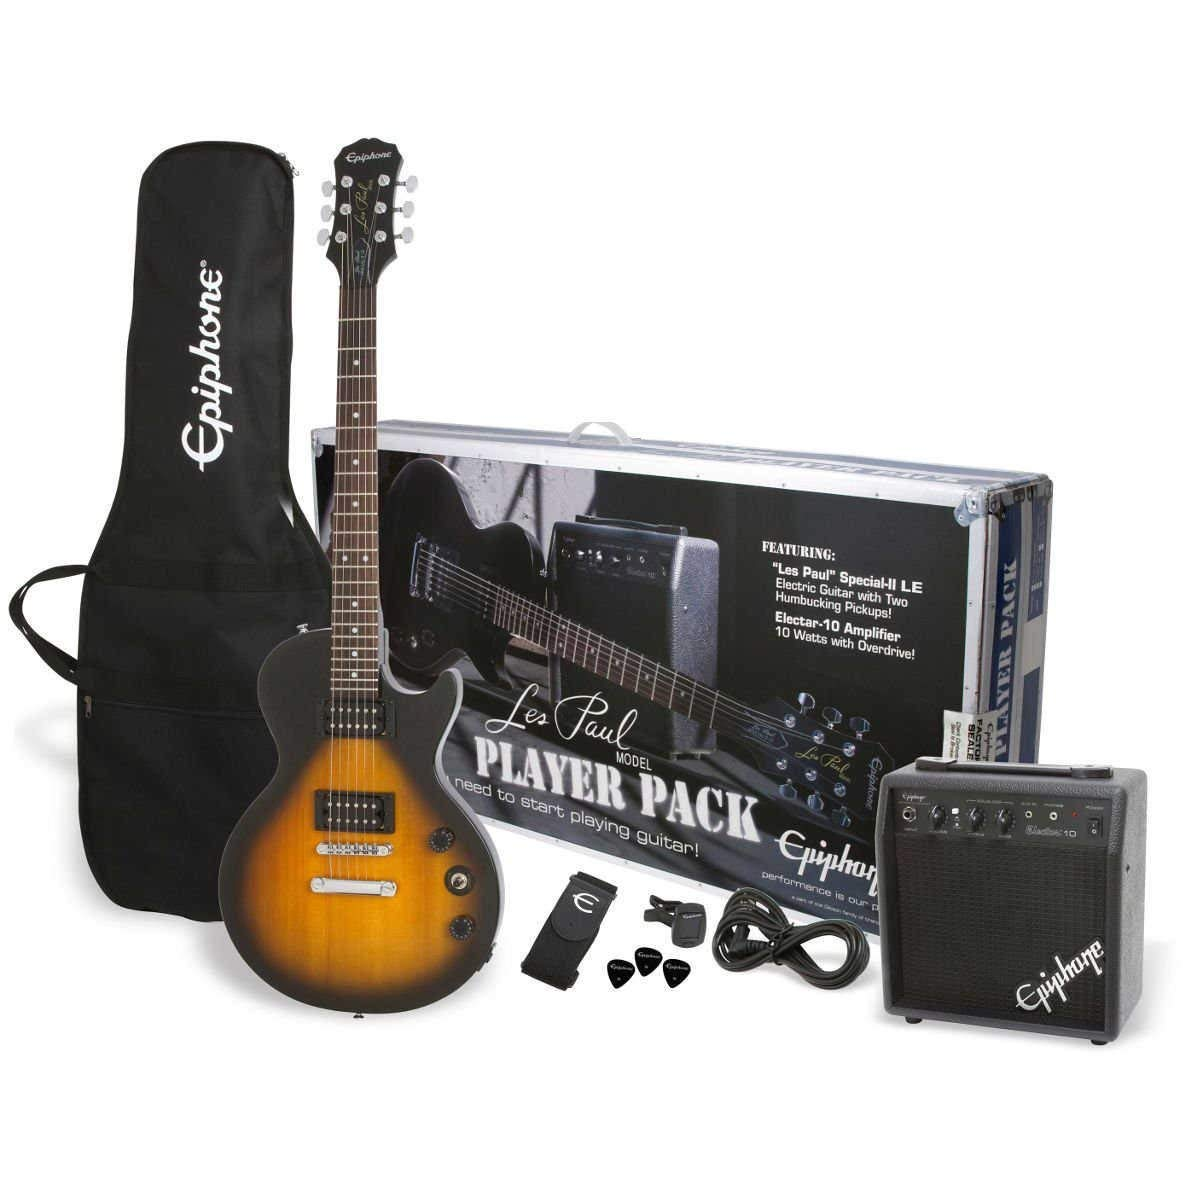 Packs guitarra Epiphone Les Paul Player Pack UK-240 V Packs guitarra eléctrica: Amazon.es: Instrumentos musicales